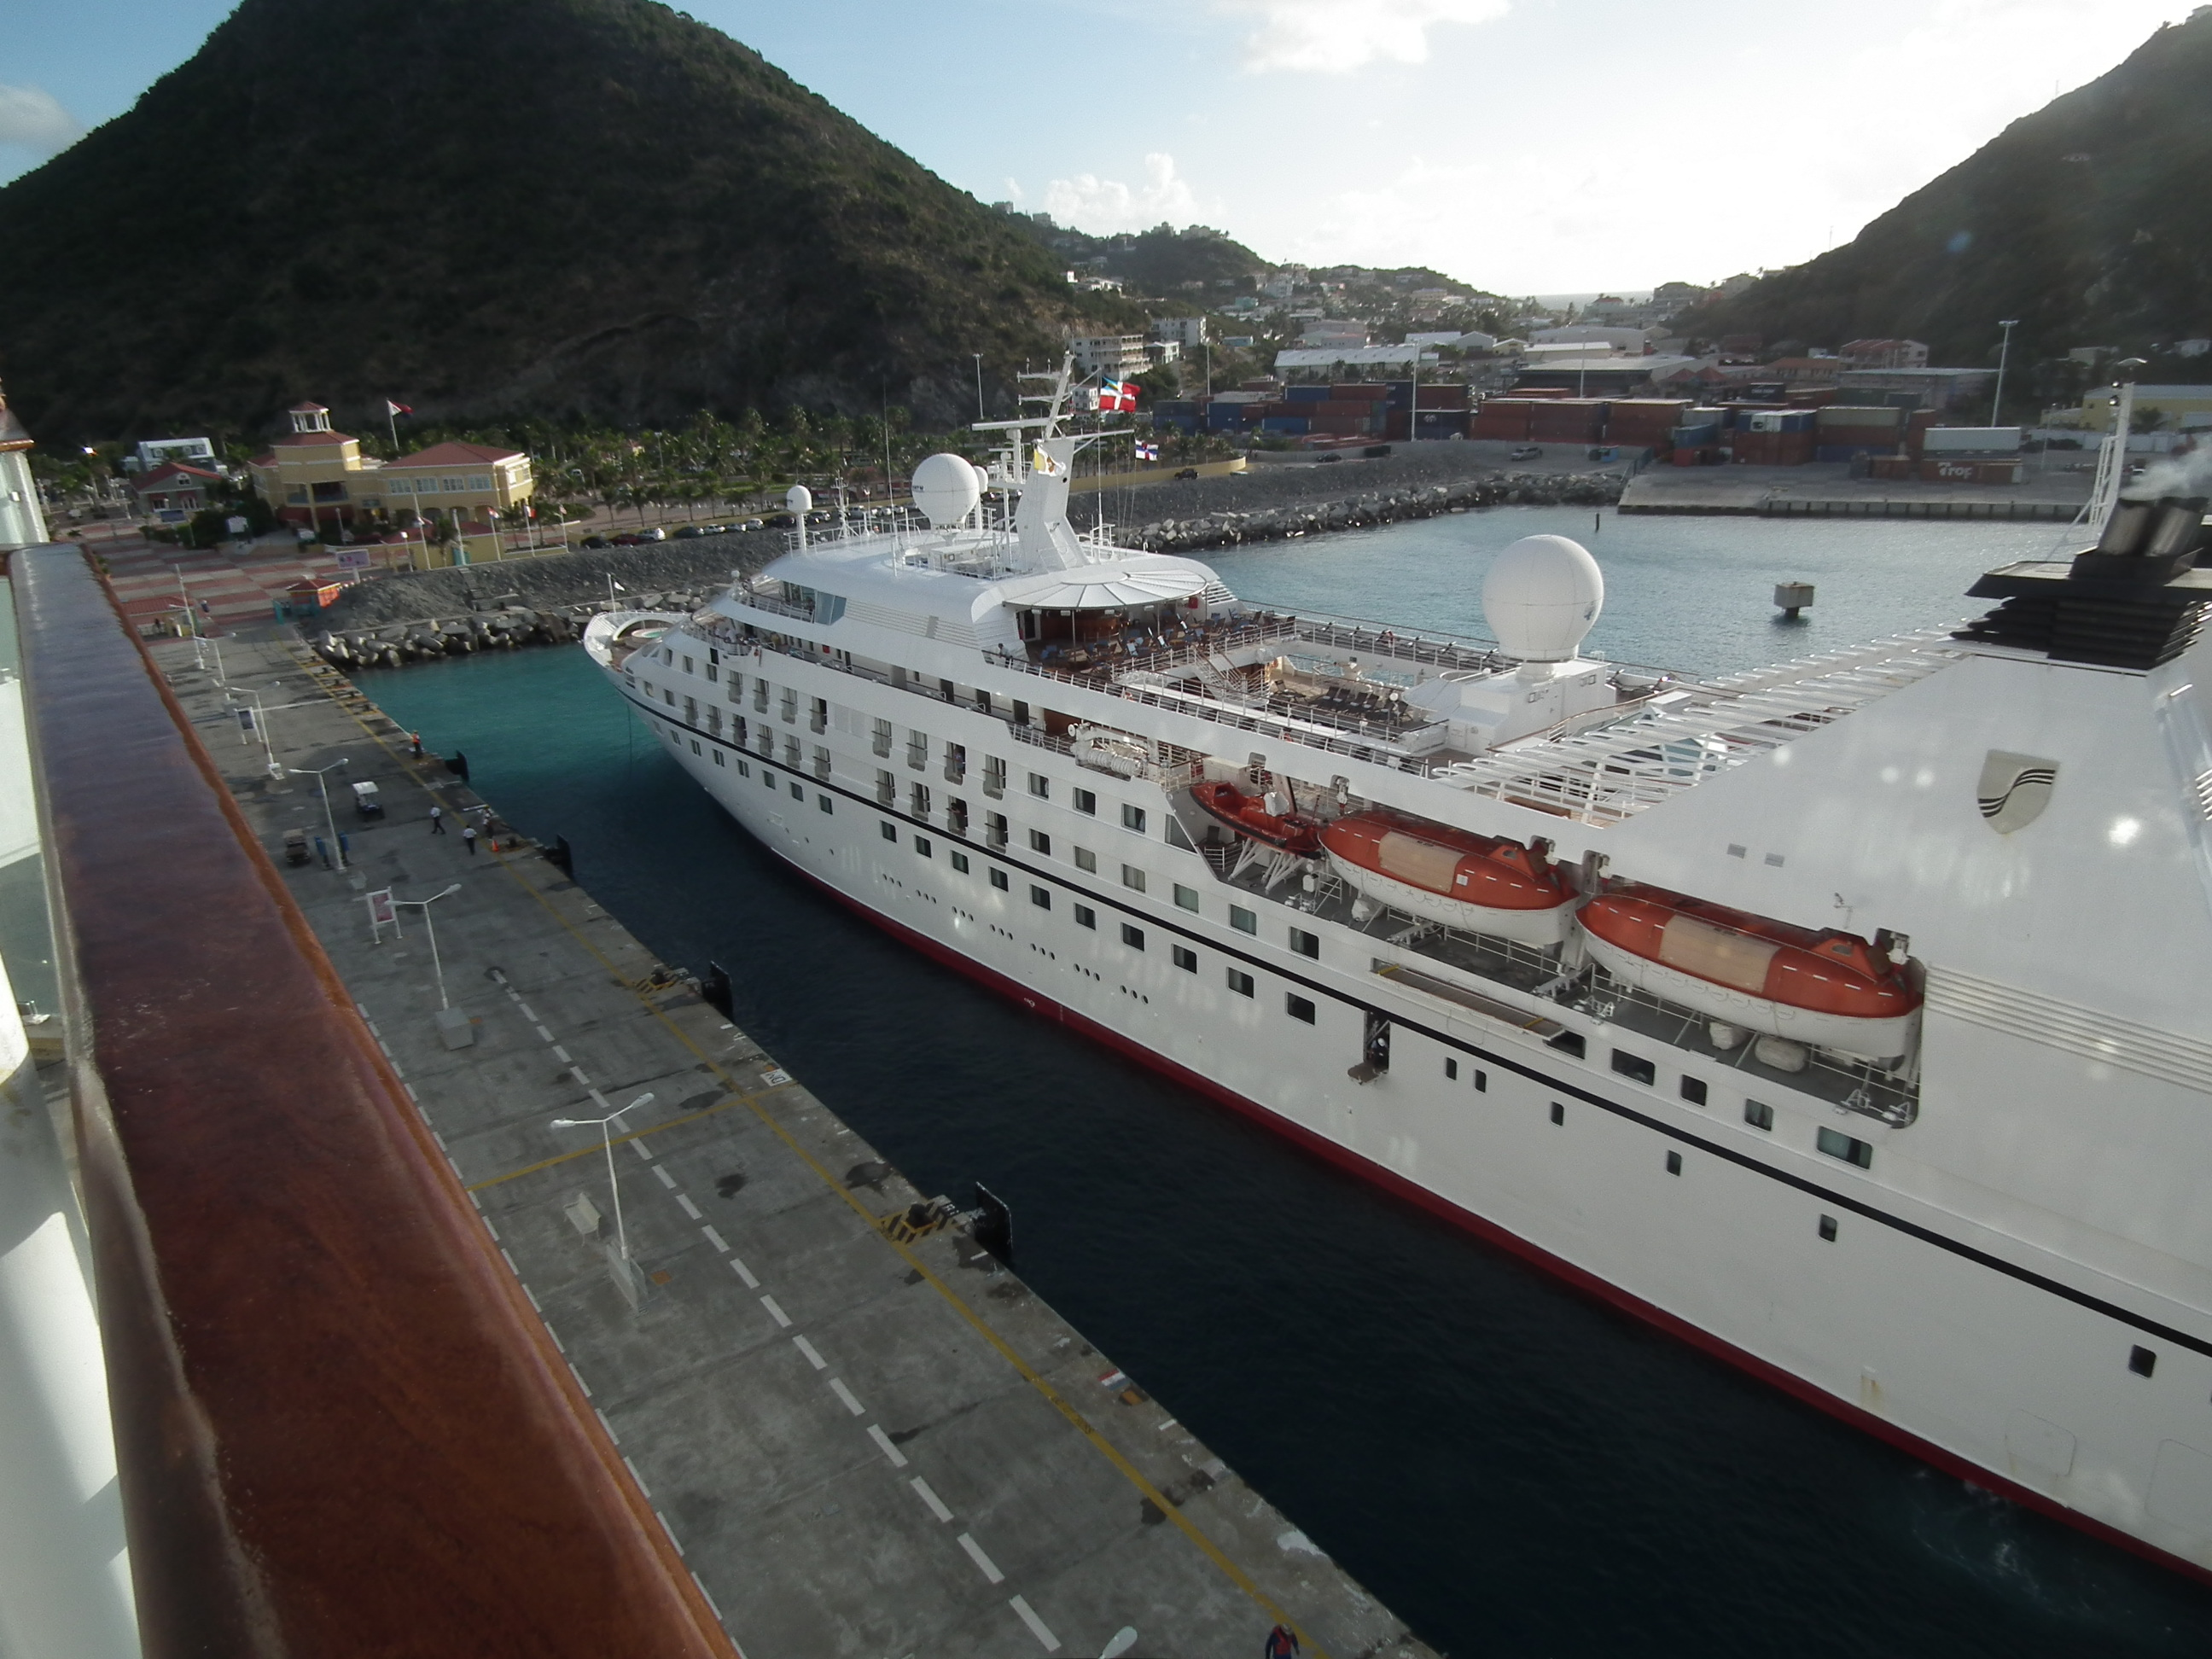 Rejoice, Tourists! St. Maarten adding prison capacity for it's many criminals